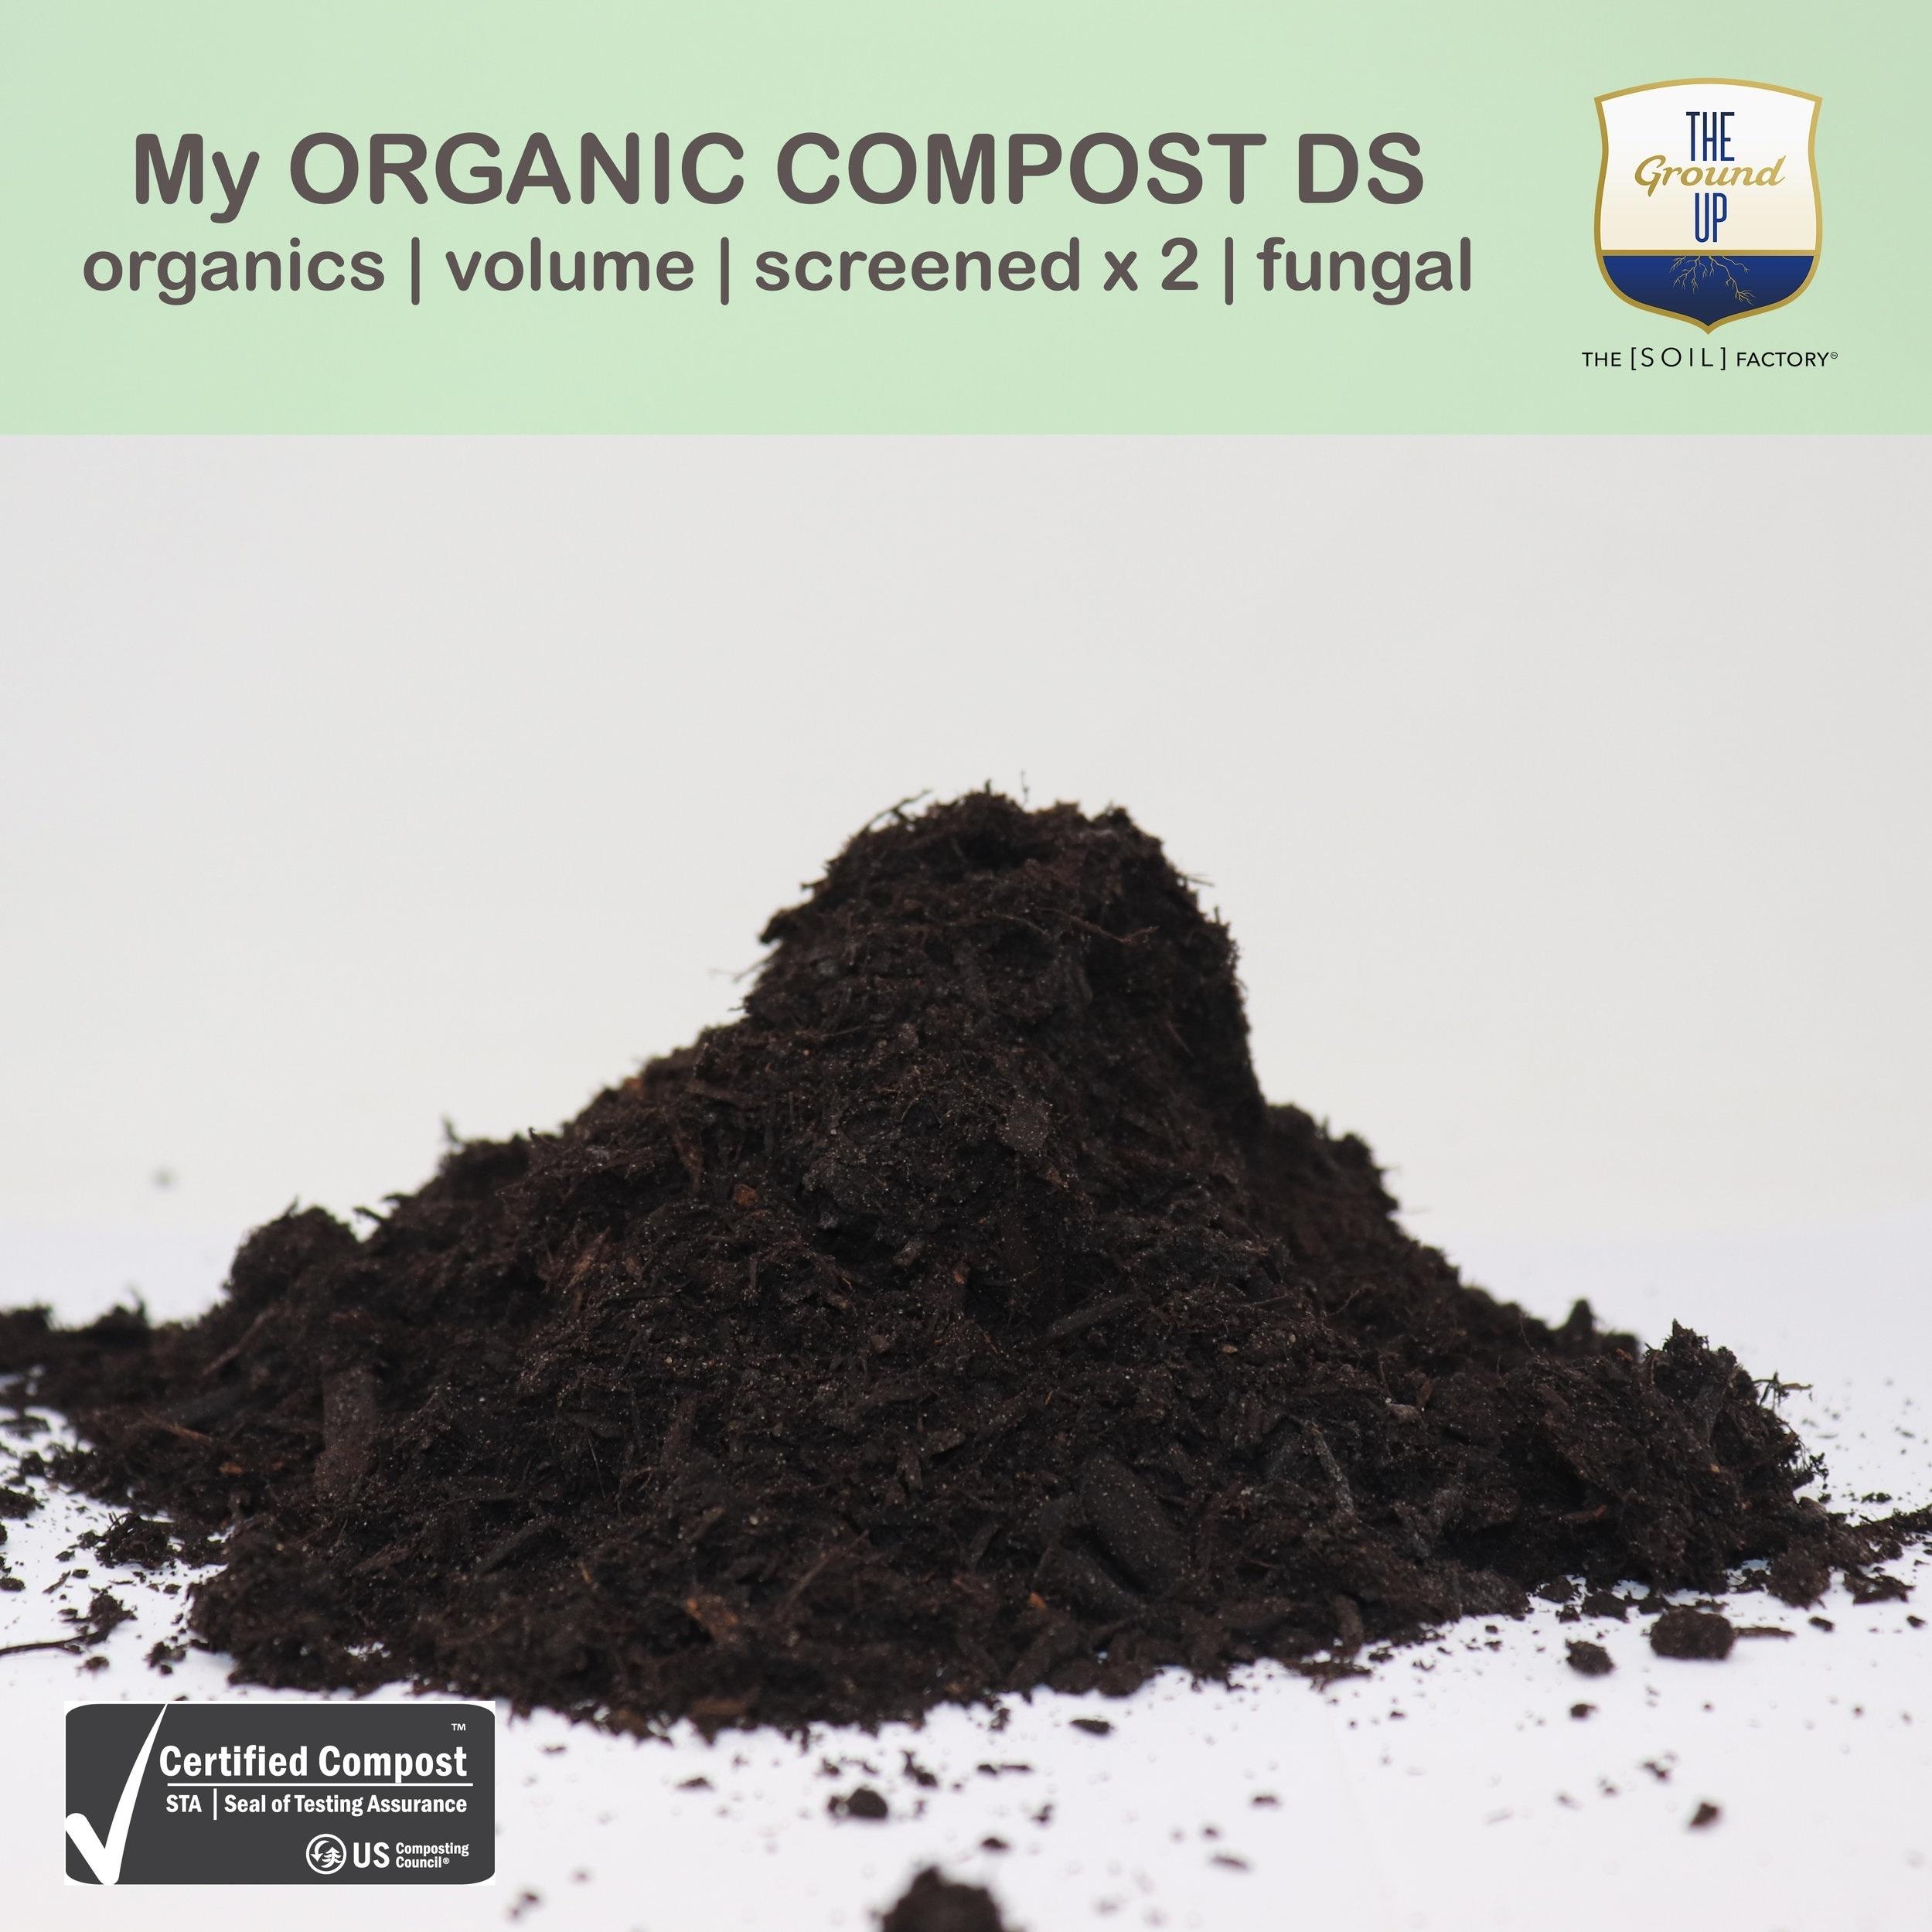 organic-compost-ds.jpg